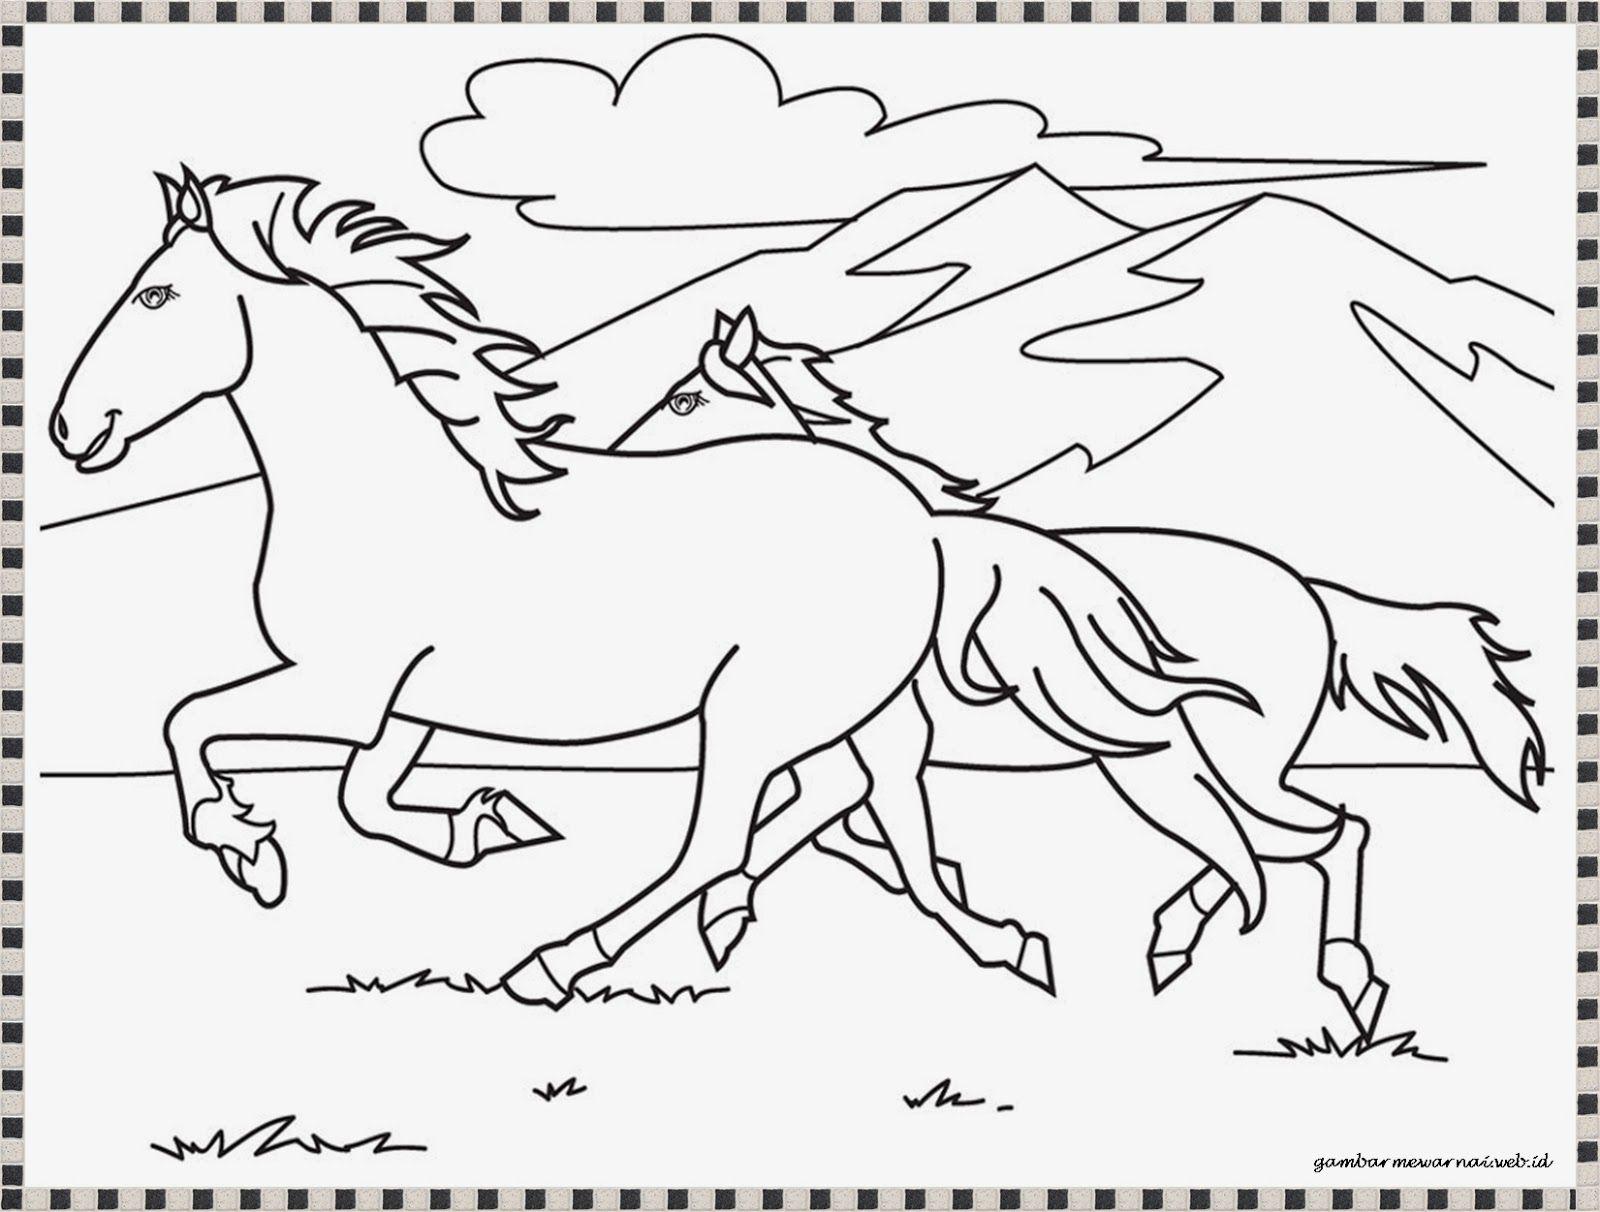 Gambar Mewarnai Kuda Liar Berlari Halaman Mewarnai Adult